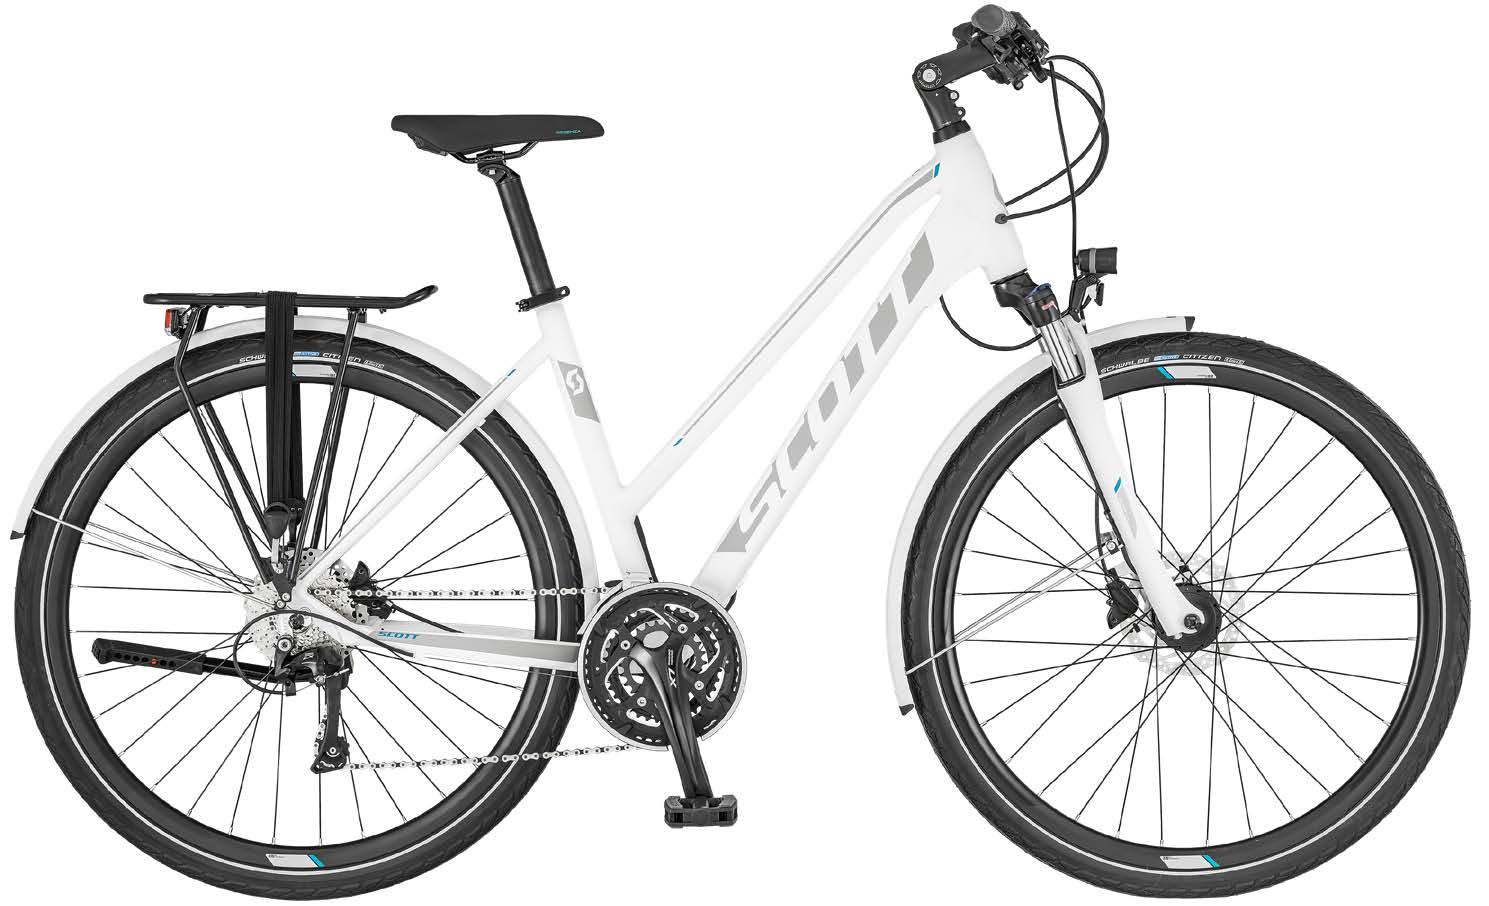 scott sub sport 20 lady modell 2019 trekkingbike rad. Black Bedroom Furniture Sets. Home Design Ideas